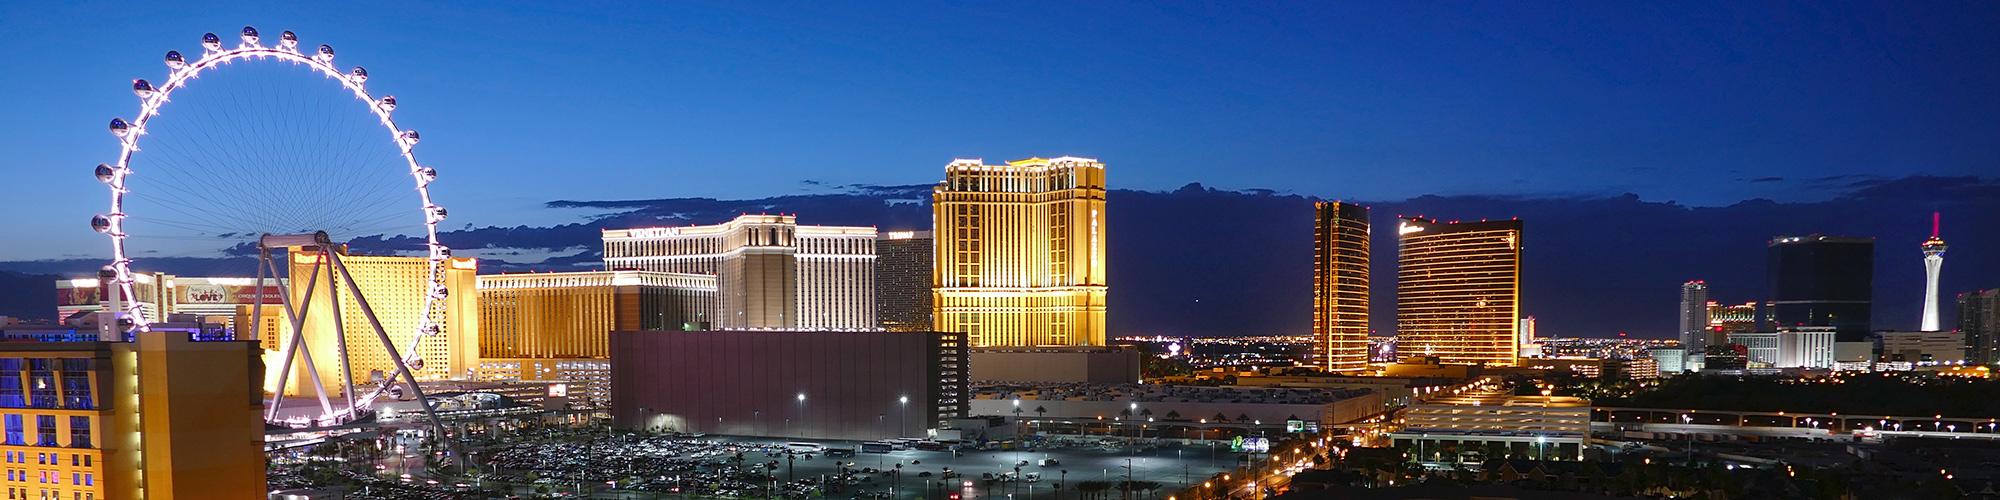 Las Vegas Activity Amp Attractions Deals Travelzoo